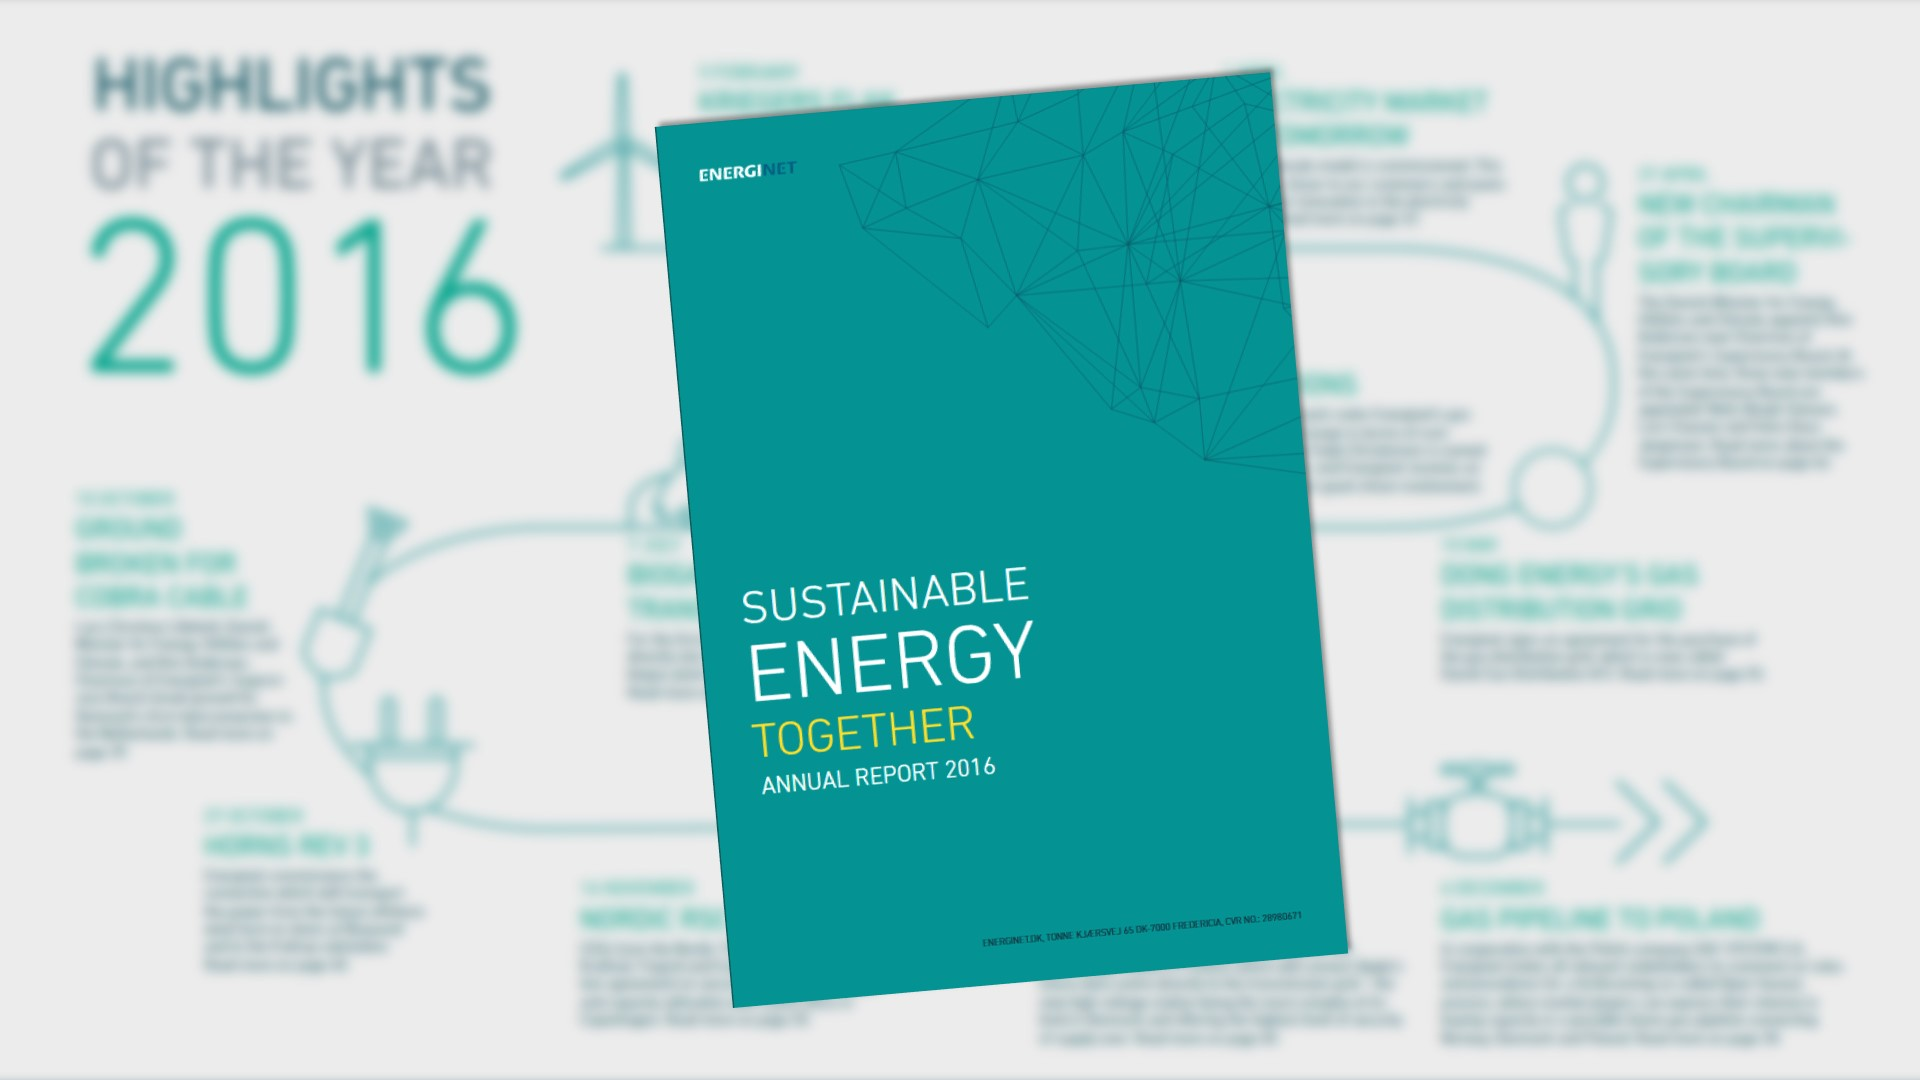 Energinet Annual Report 2016